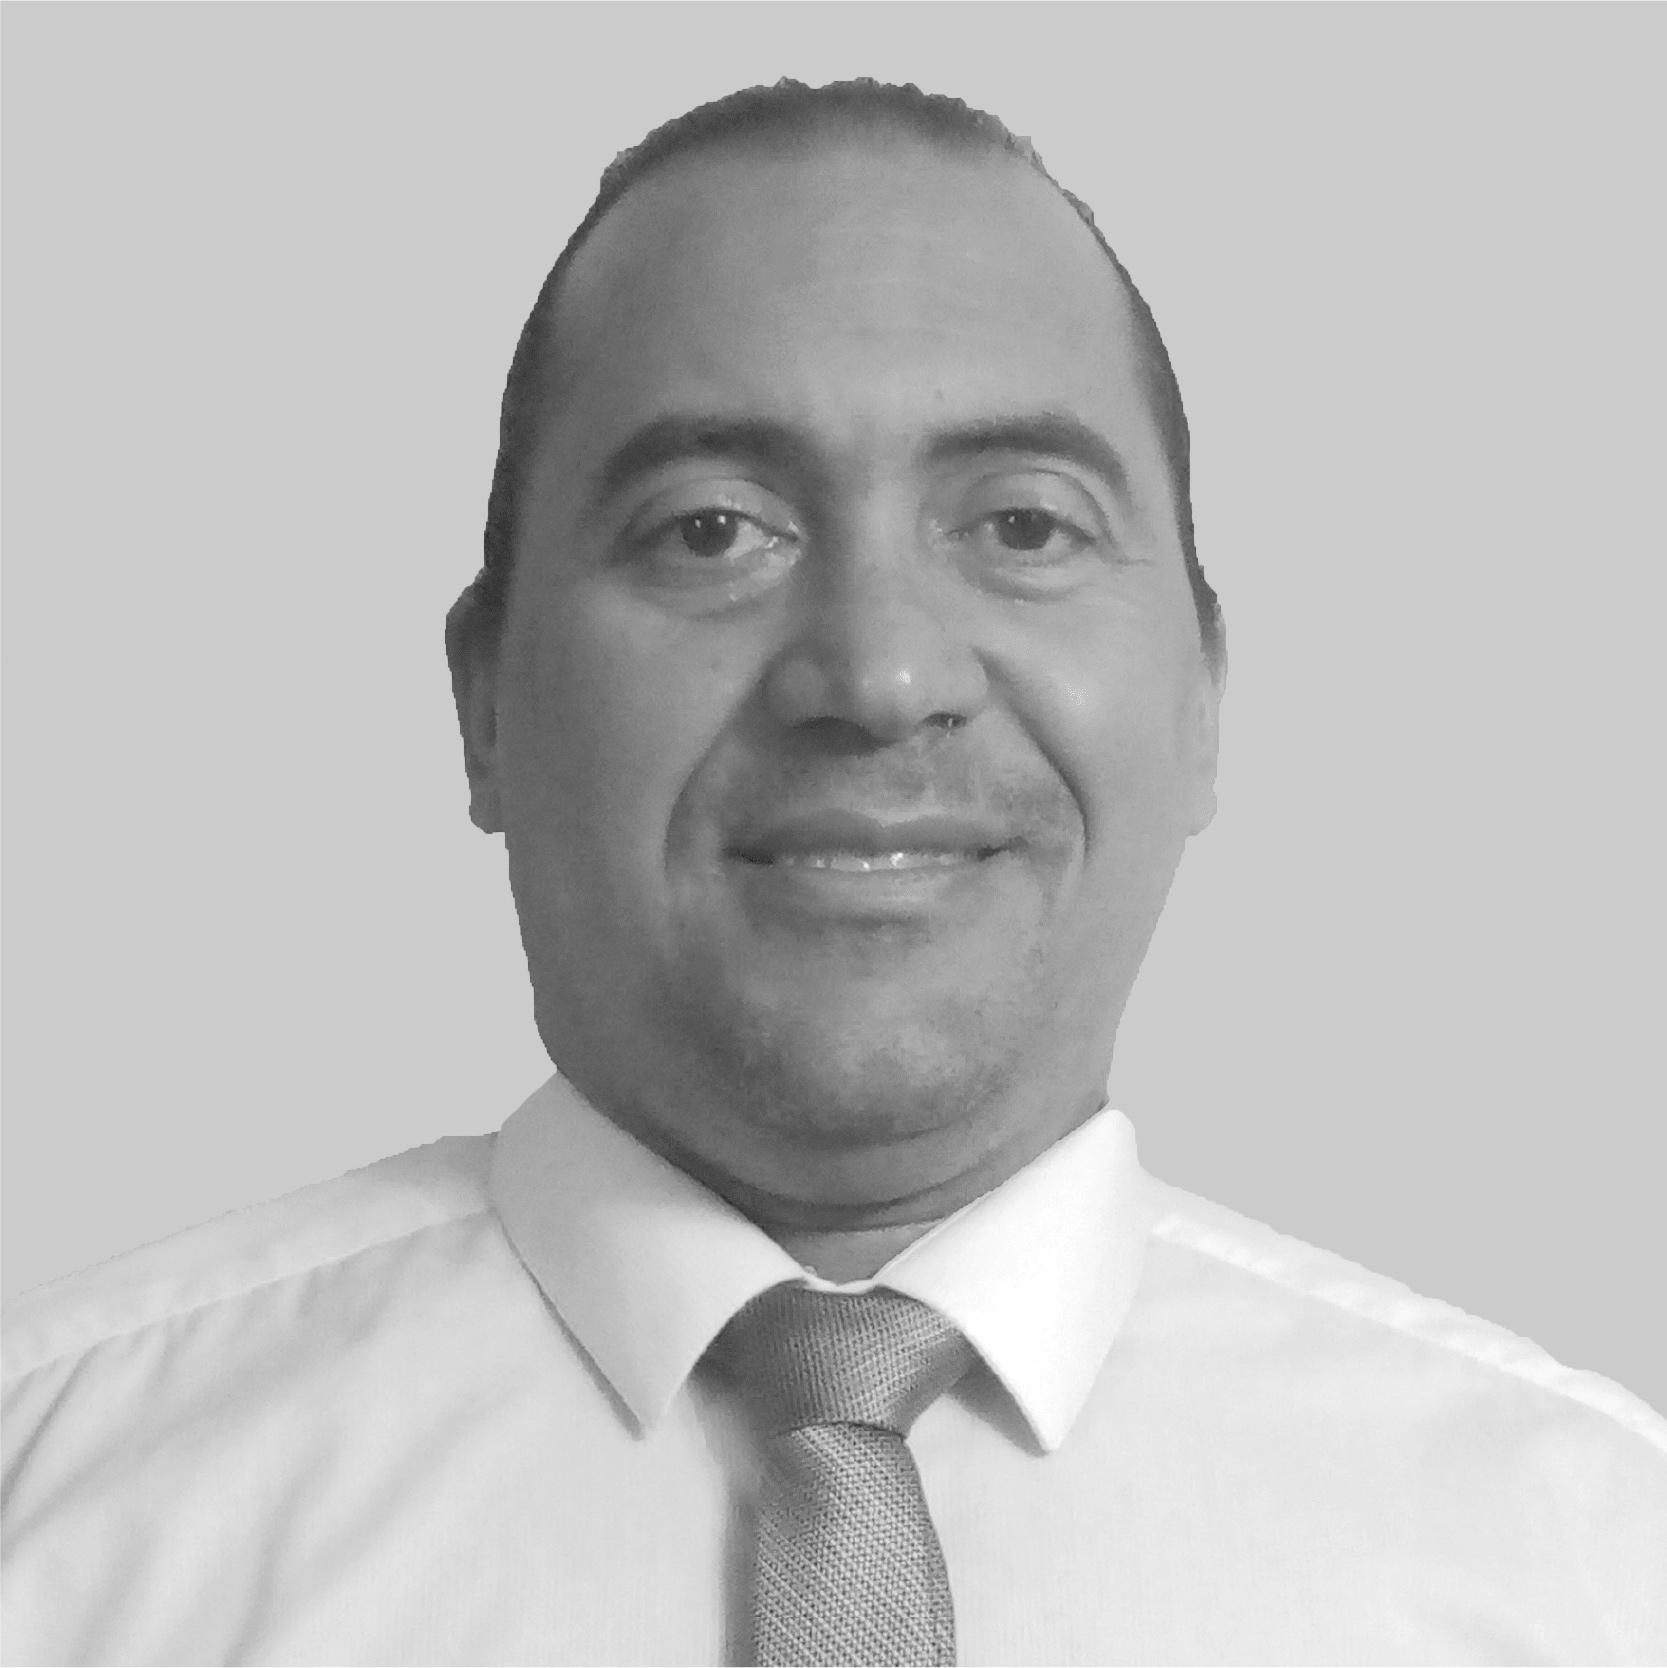 Jorge Luis Martelo